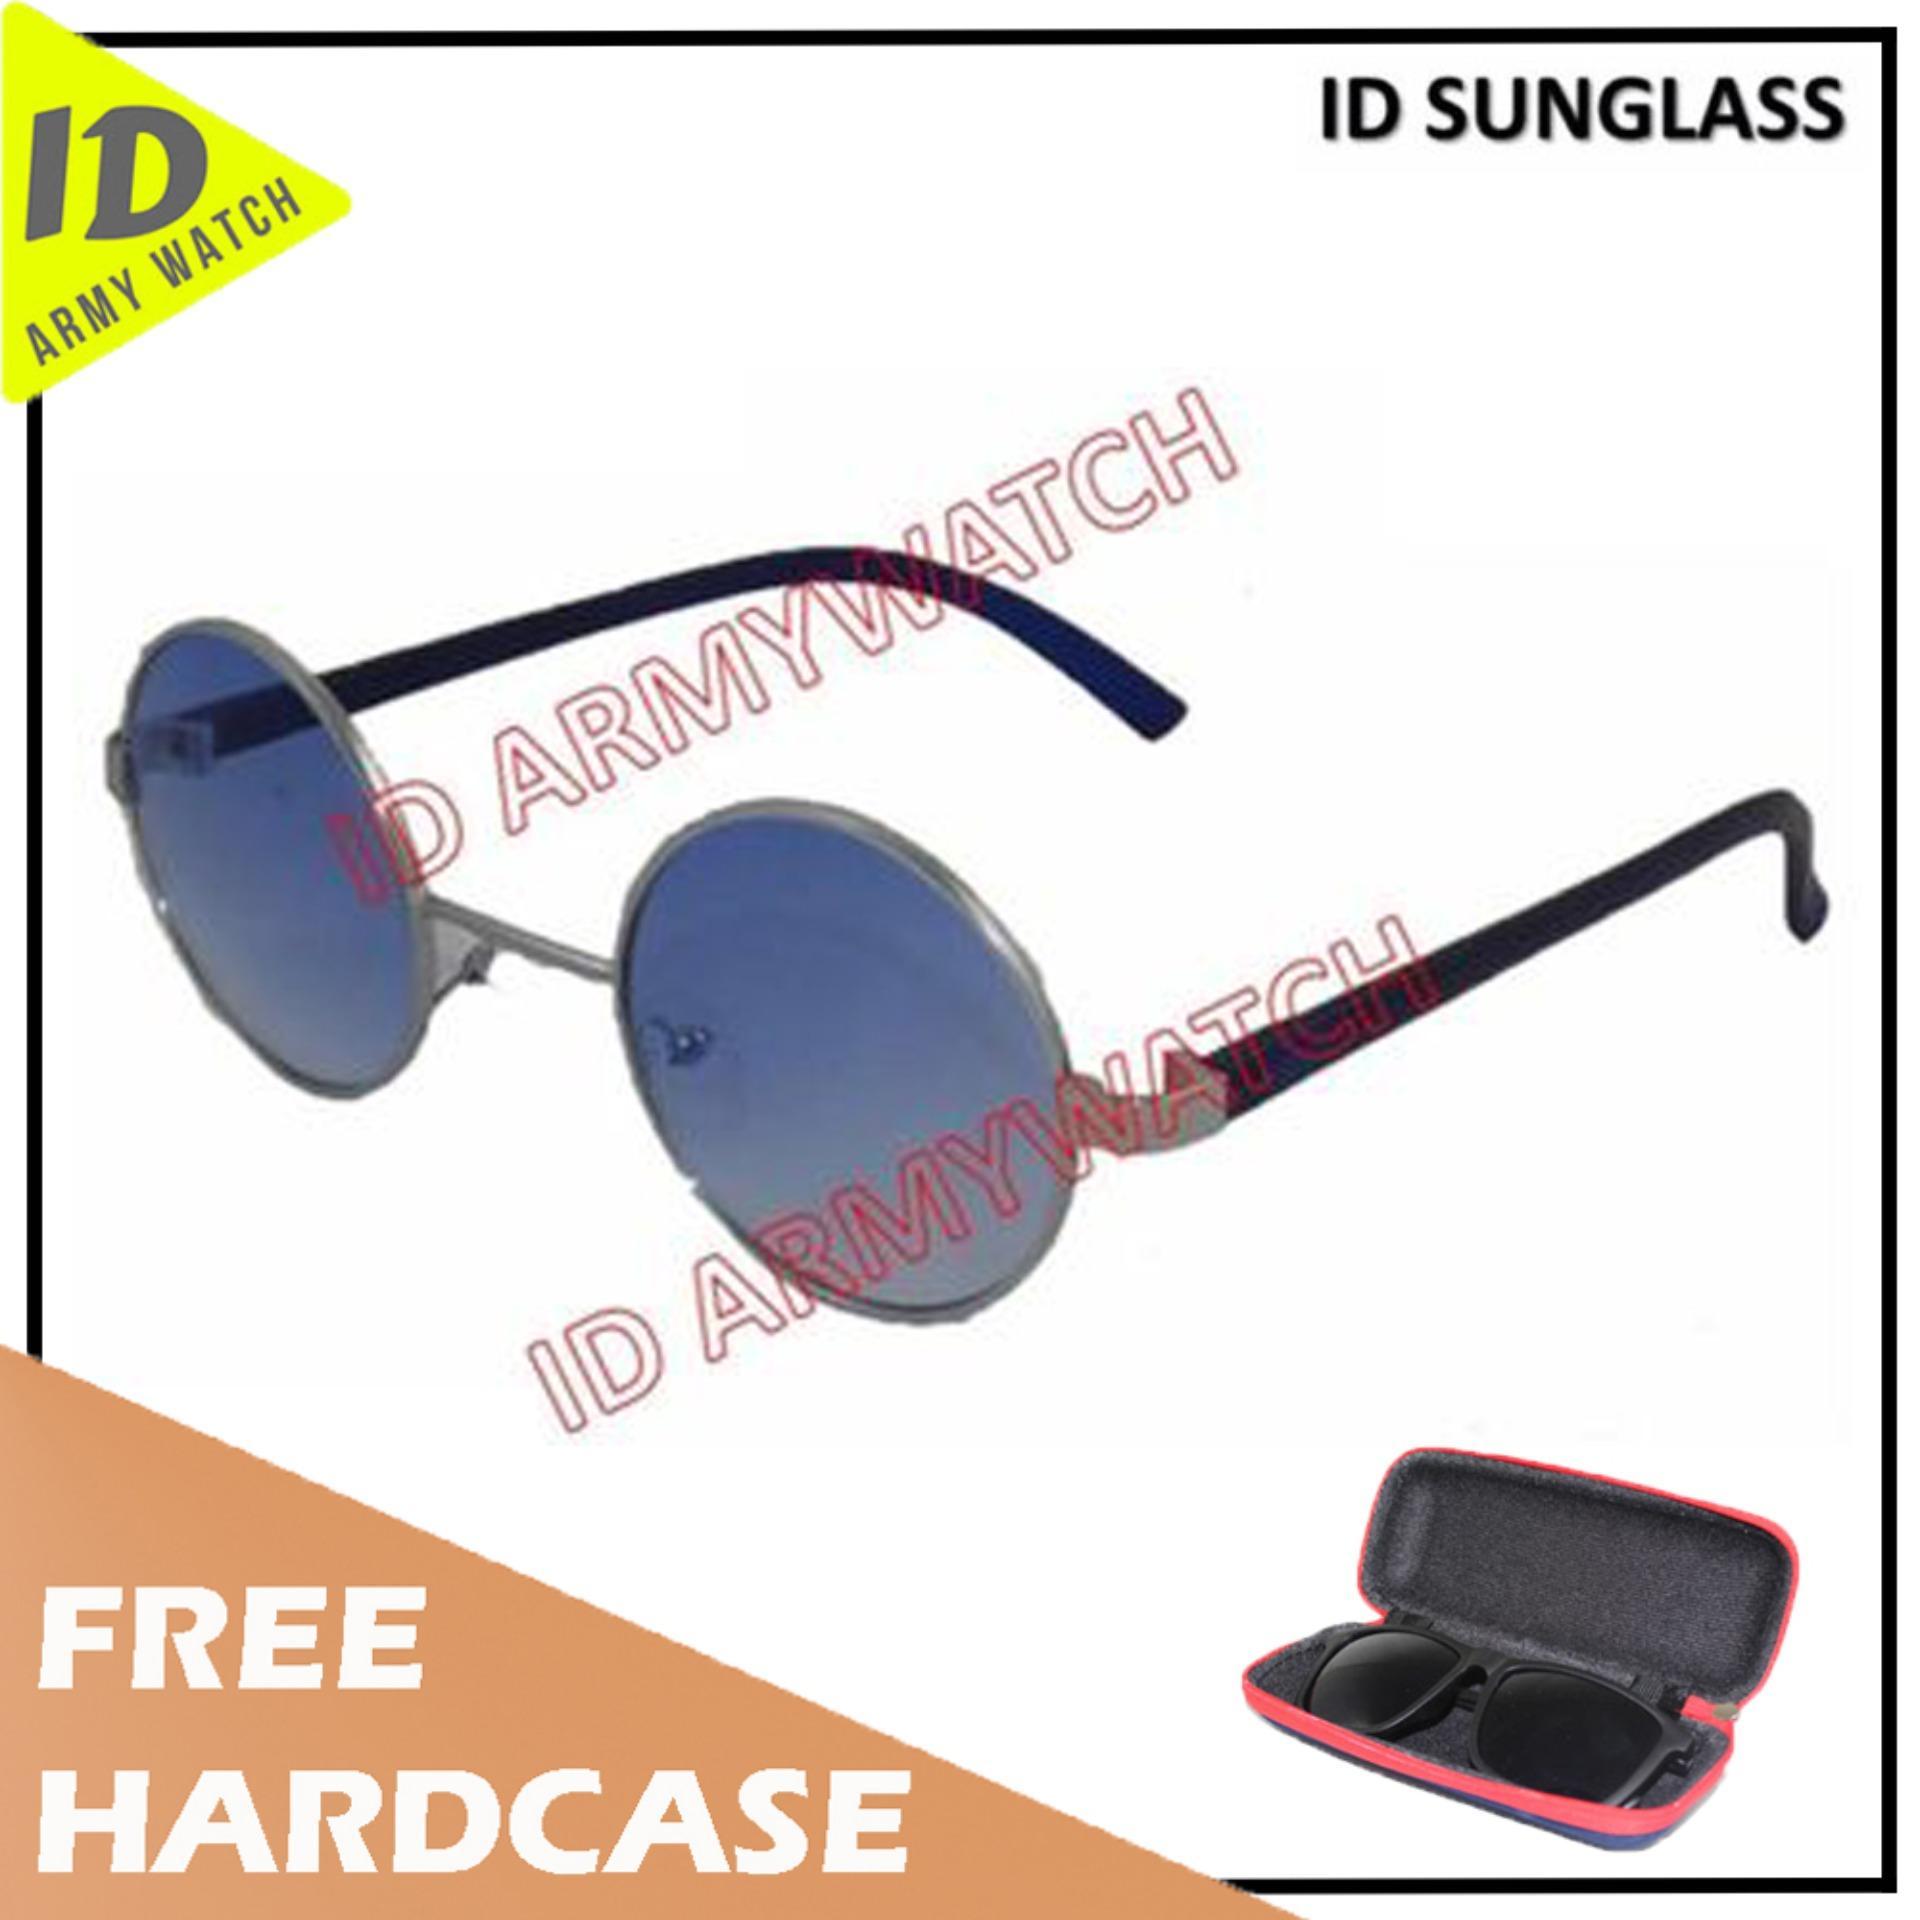 ID Sunglass - Kacamata Bulat Round Pria Wanita - Frame Silver - Lensa Biru  SUN 1001 b37597b9fd